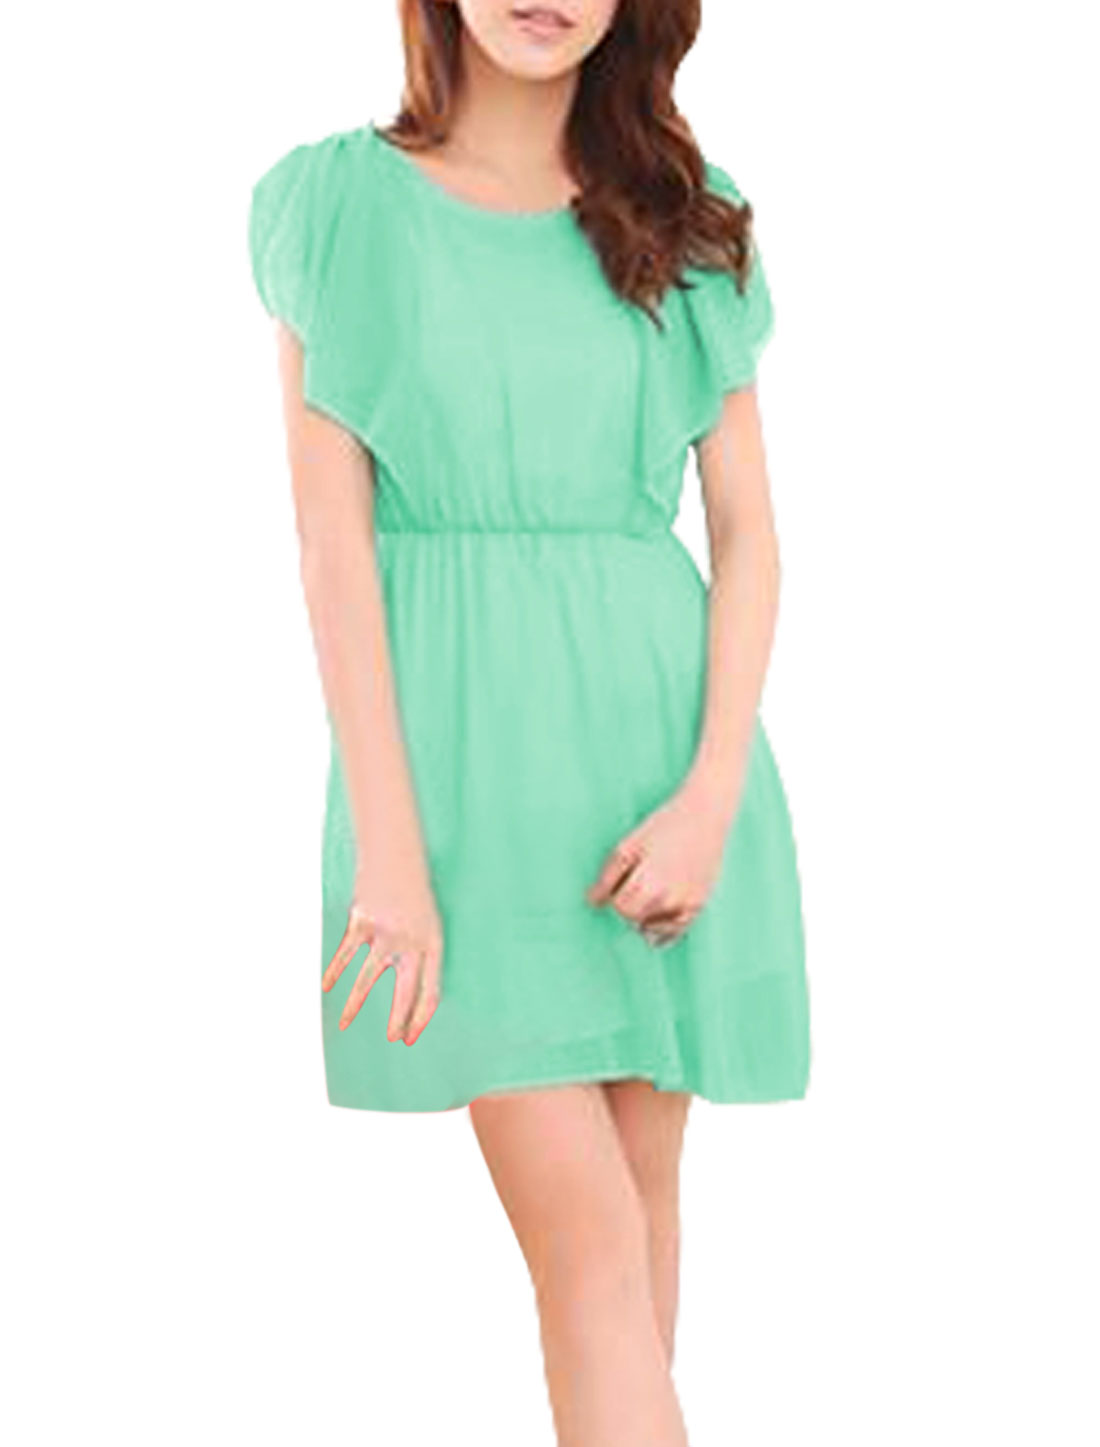 Ladies Sleeveless Ruched Splice Shoulder Elastic Waist Light Green Mini Dress XS